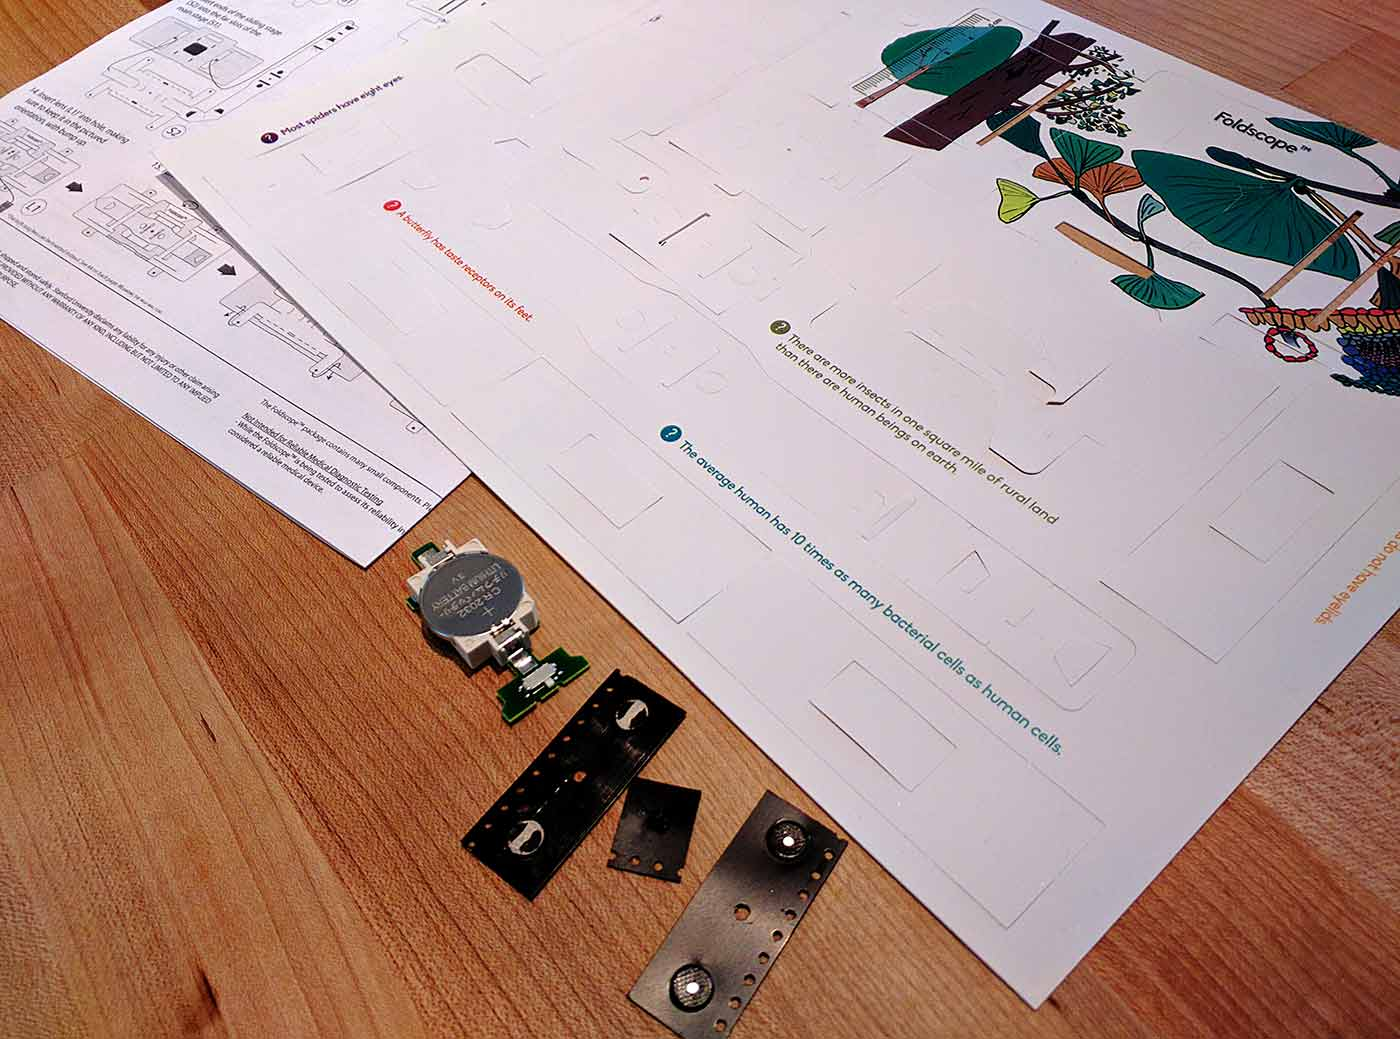 Foldscope parts